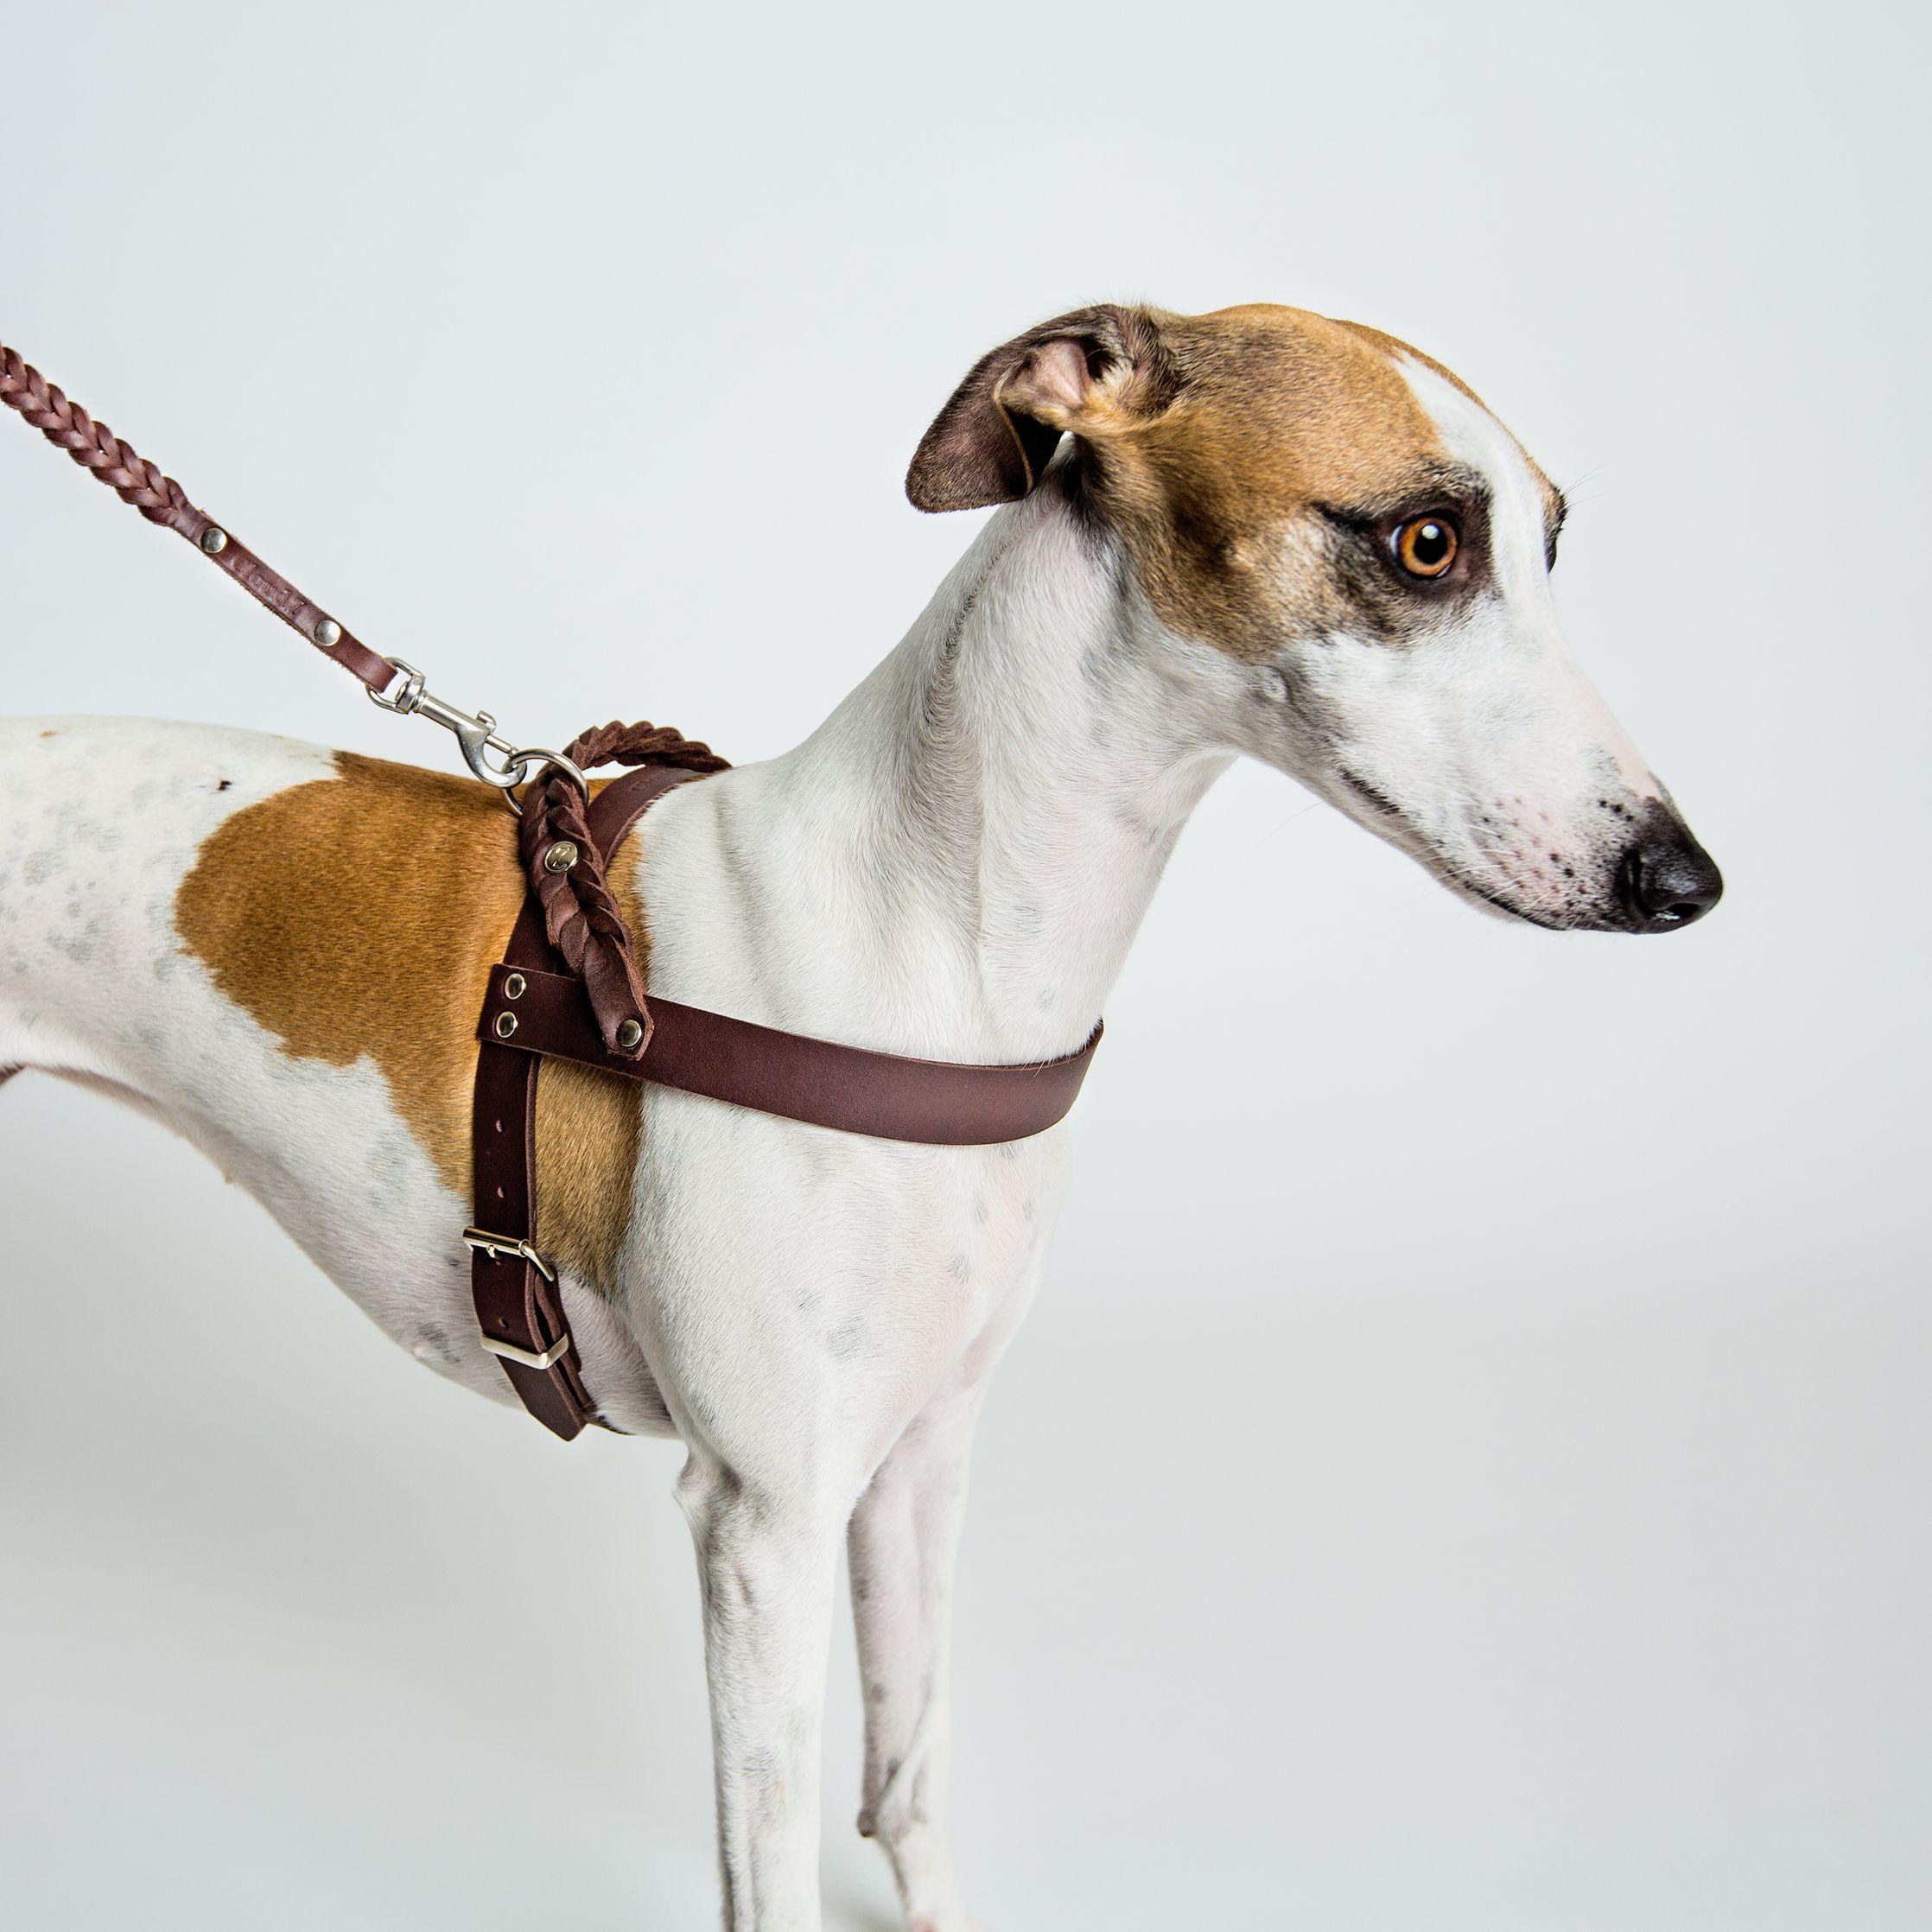 Cloud7 Designer Leather Dog Harness By Lavish Tails